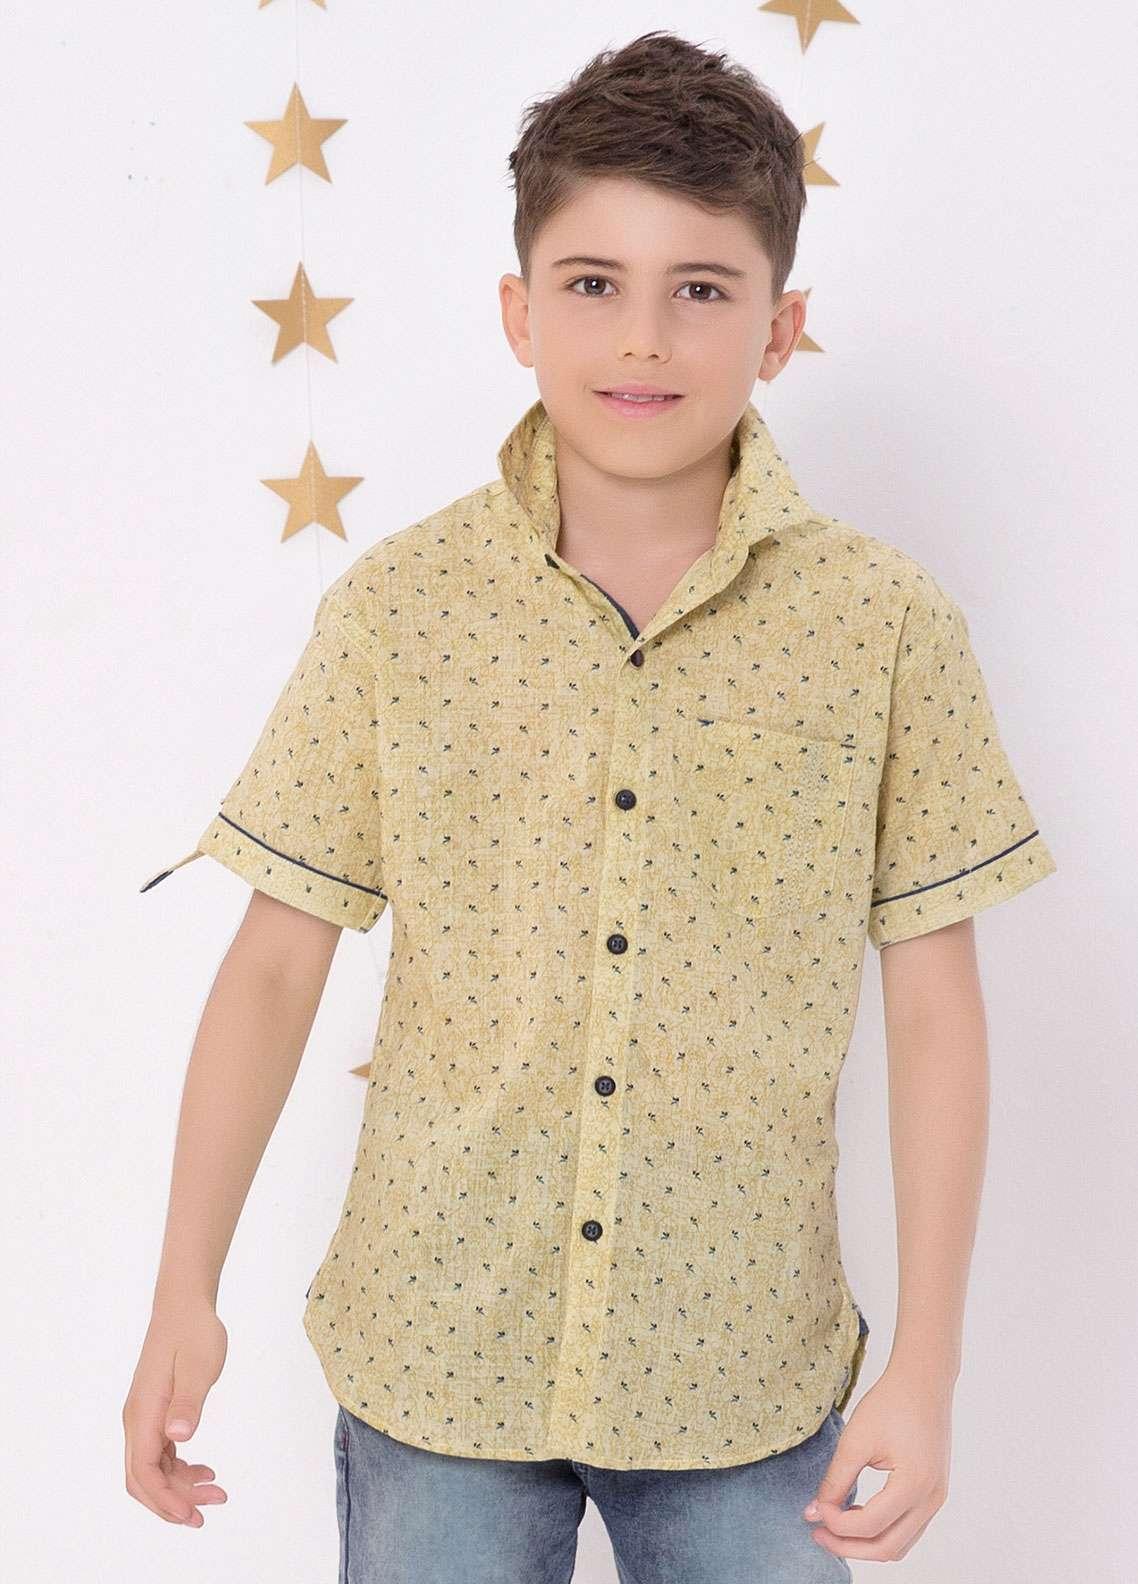 Edenrobe Cotton Casual Boys Shirts - Brown EDK18CS 27185